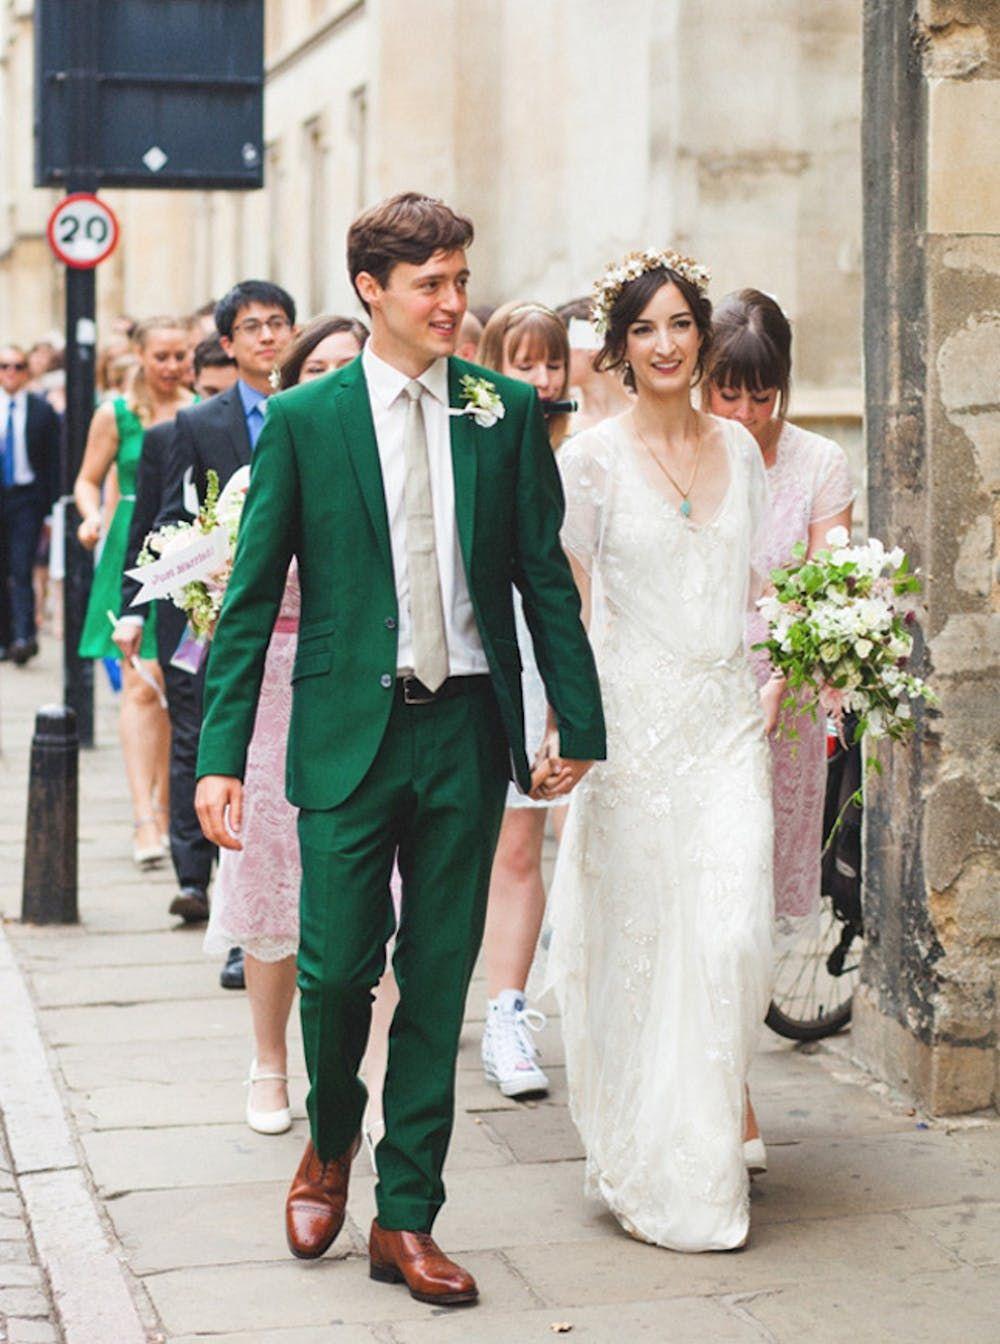 Pin by TIVOL on TIVOL NonTraditional Weddings in 2019